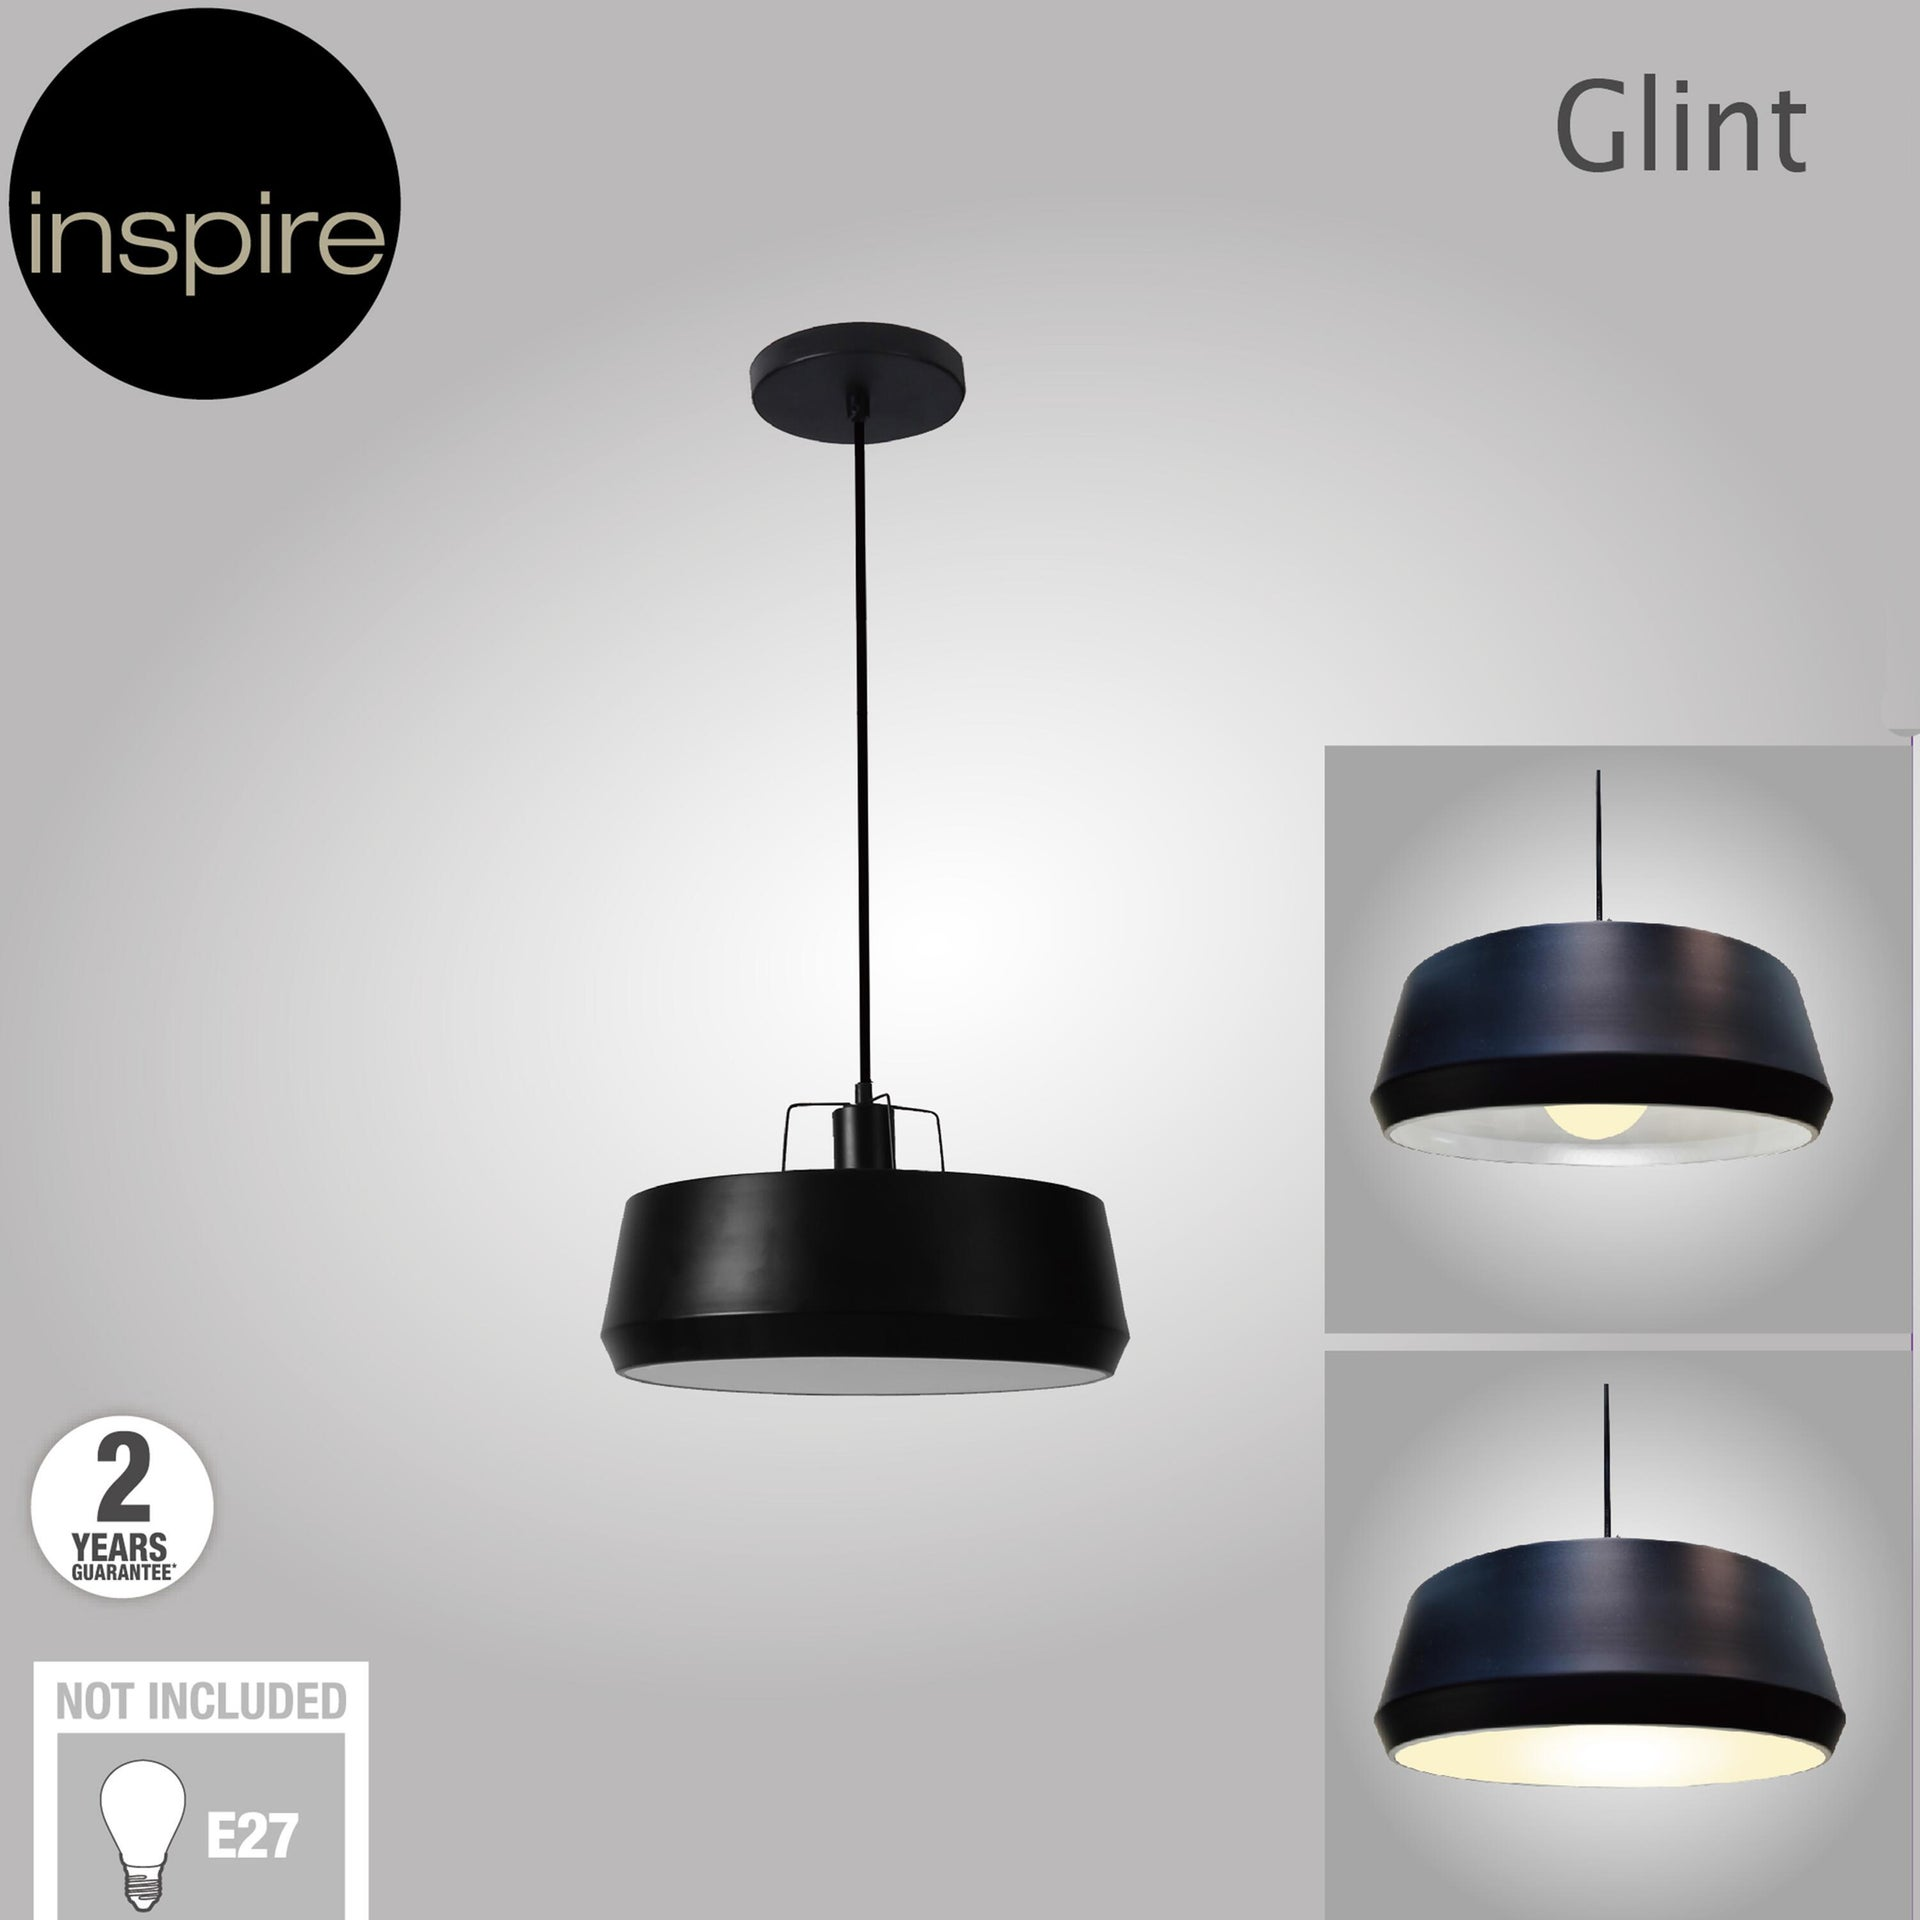 Lampadario Industriale Glint nero in metallo, D. 35 cm, L. 32 cm, INSPIRE - 5